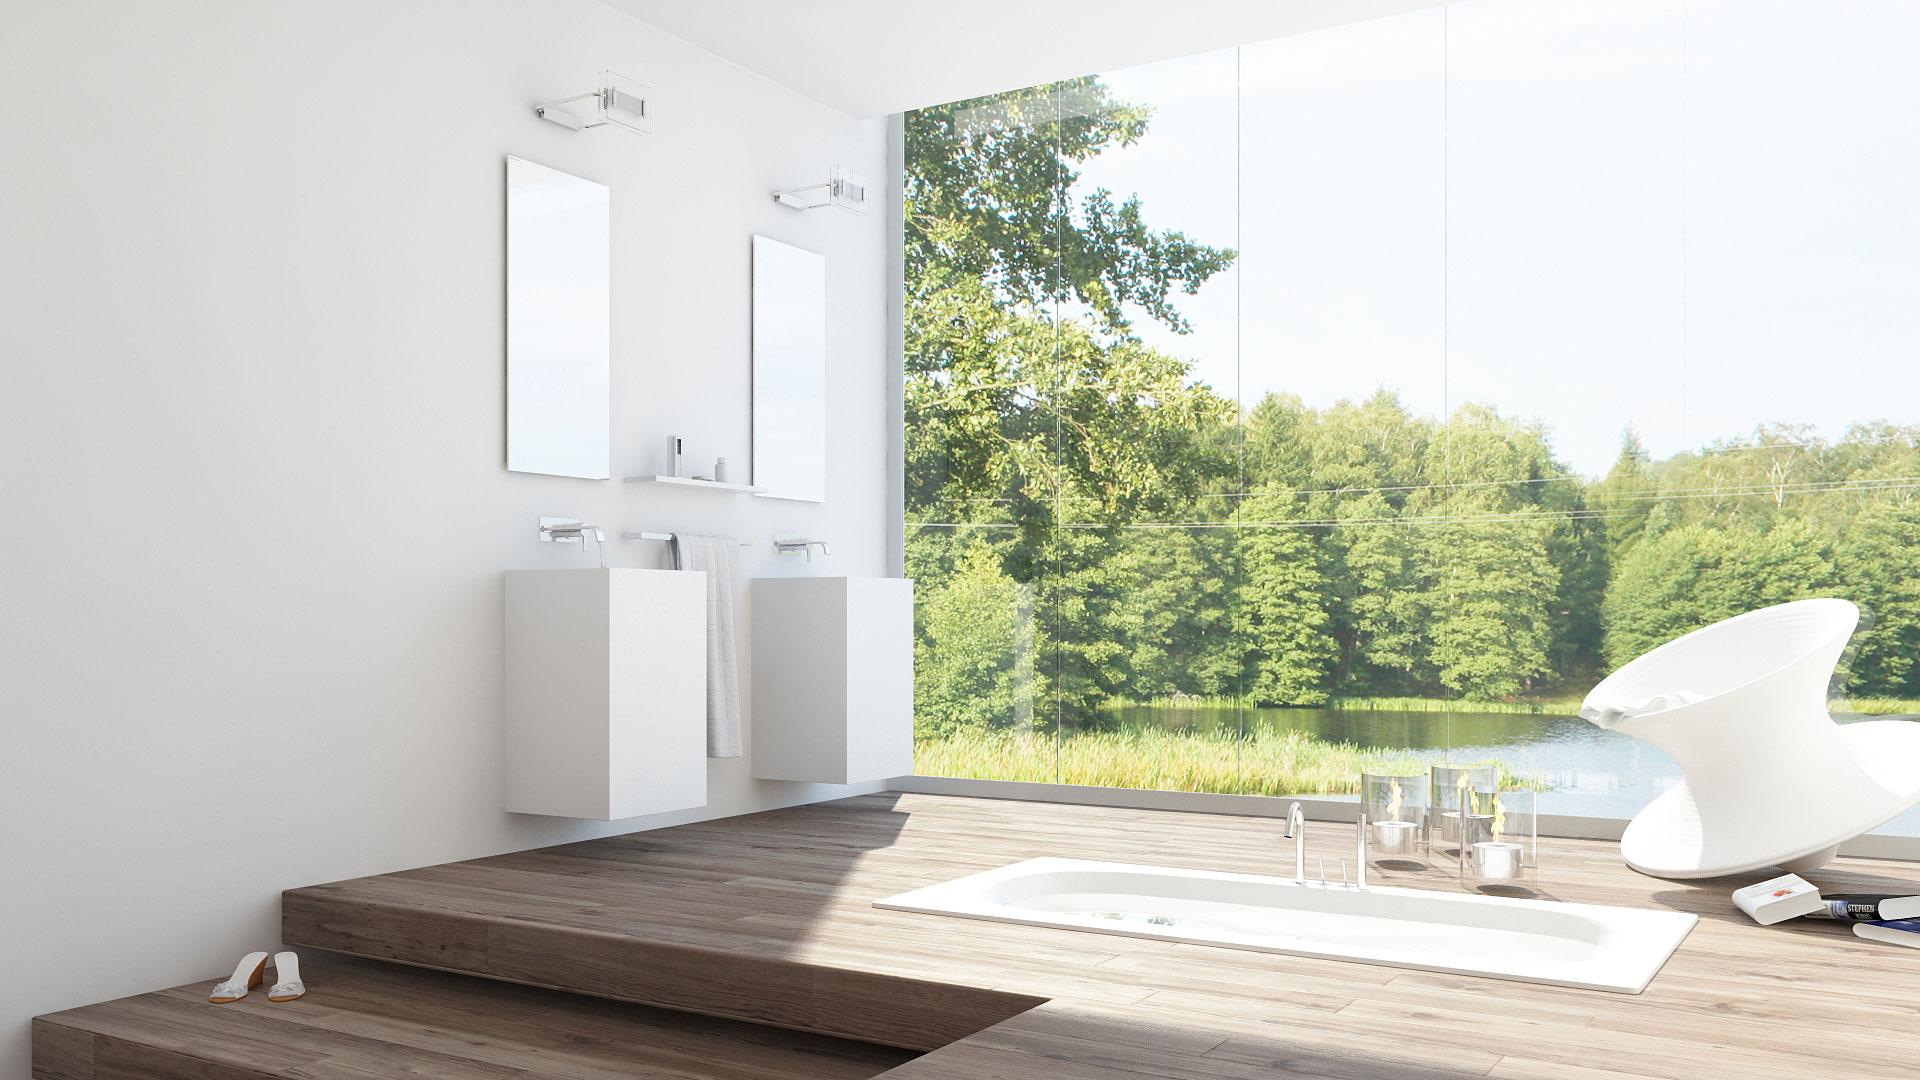 salle de bain design, baignoir encastrée au sol, Spunchair, Magis, Thomas Heatherwick, fauteuil toupis, salle de bain bois, vasque corian,